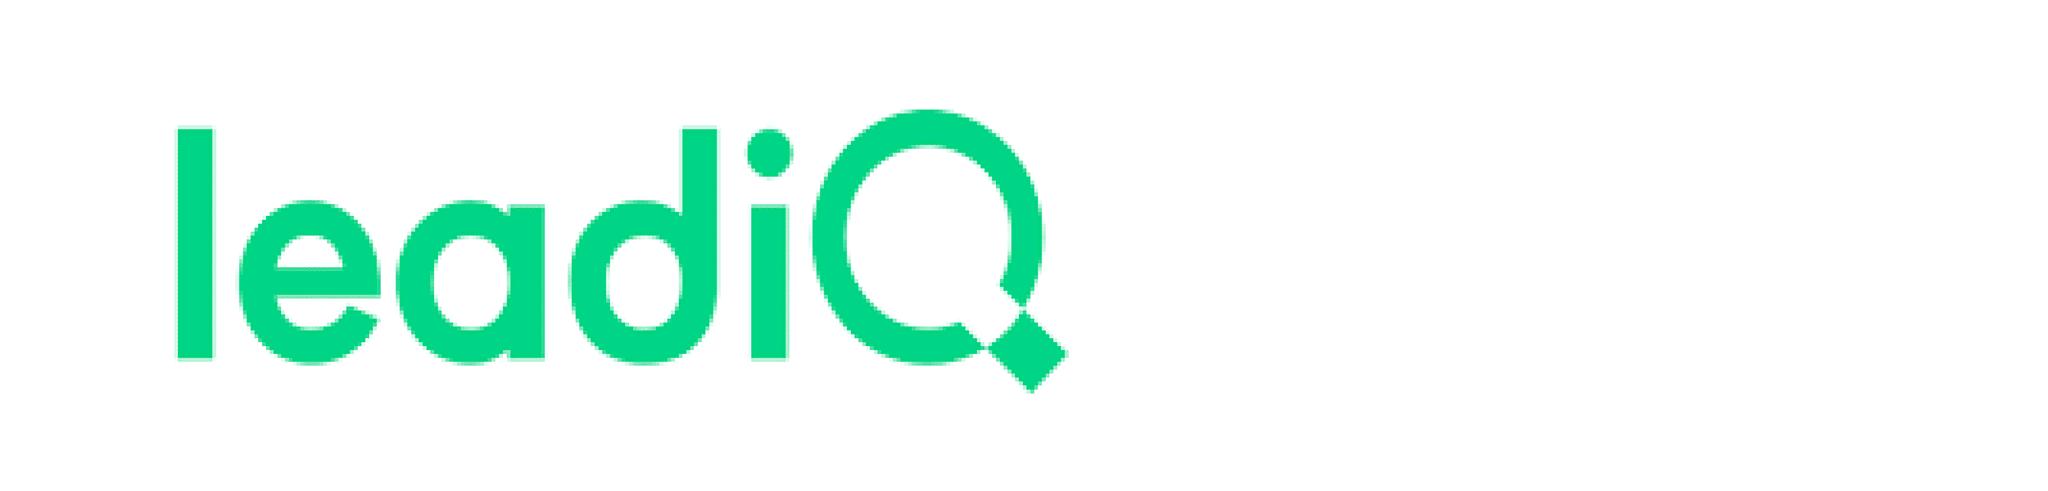 LeadIQ brand logo